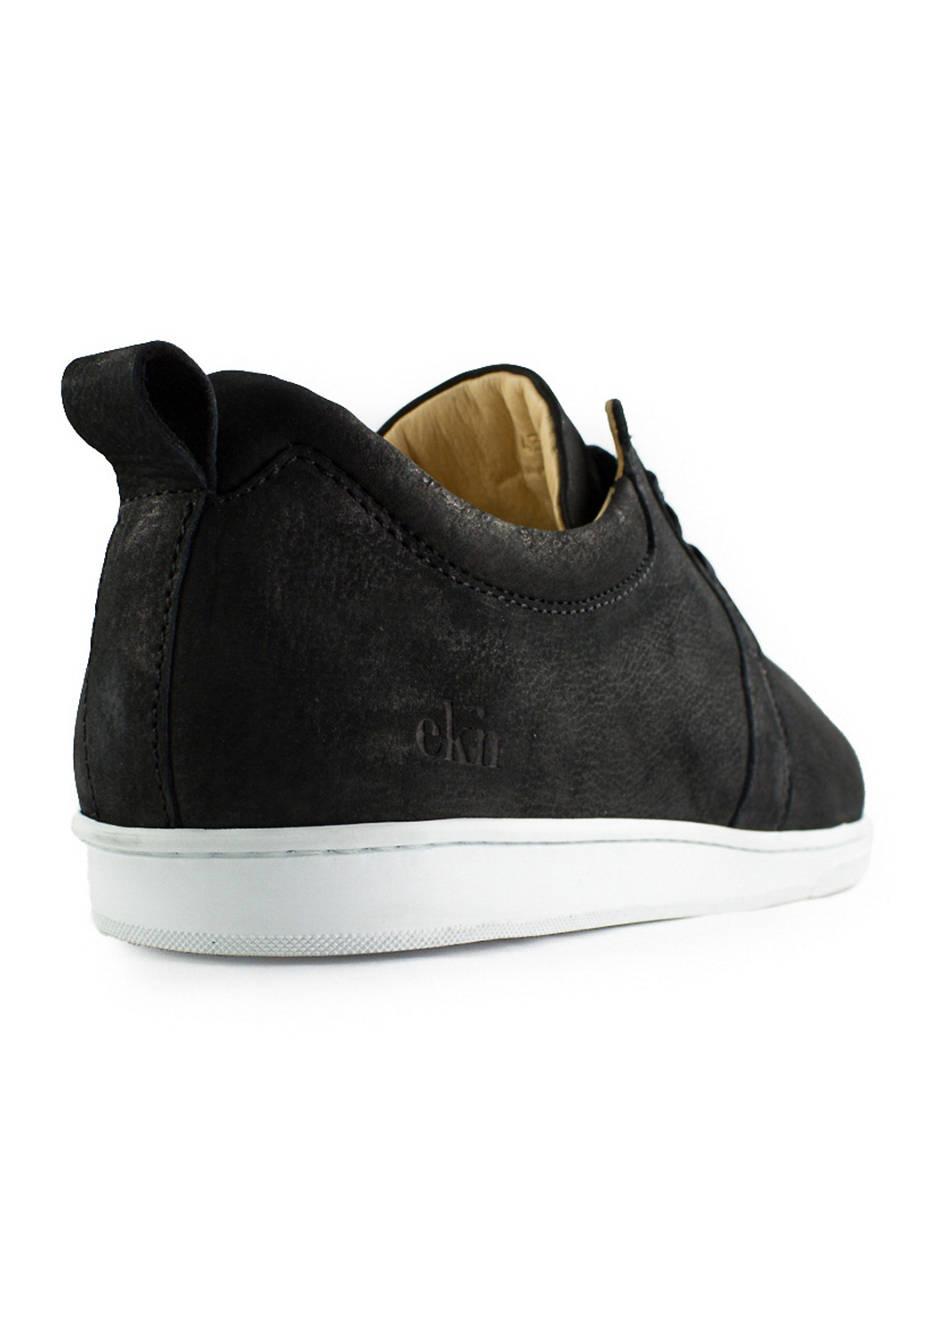 Birch / Black Leather